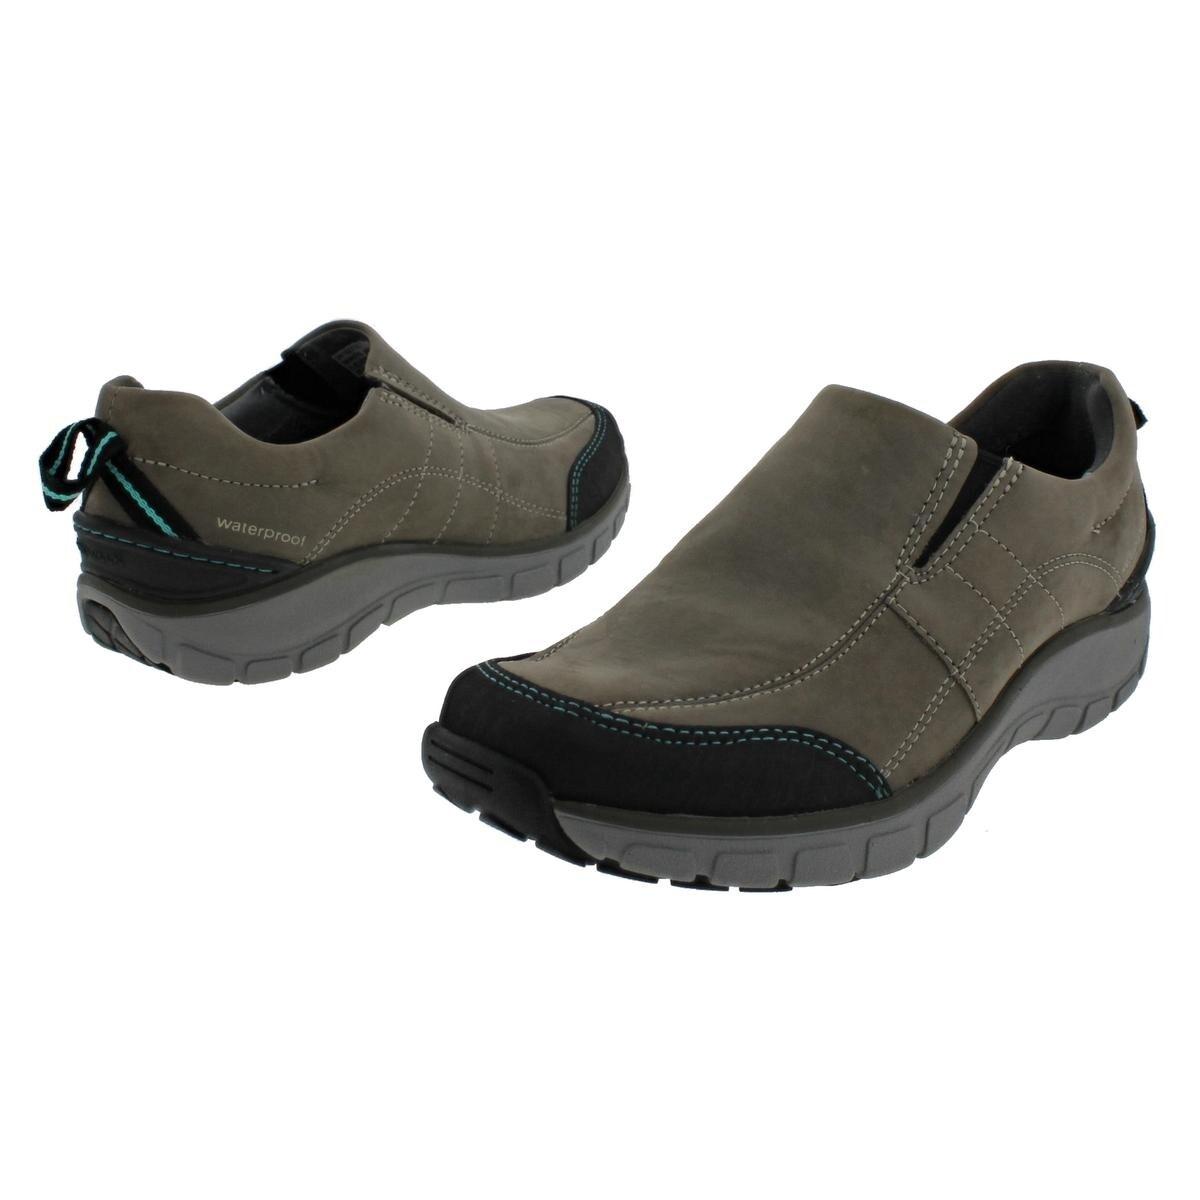 19020877ffa Clarks Womens Wave Brook Walking Shoes Leather Waterproof - 7 medium (b